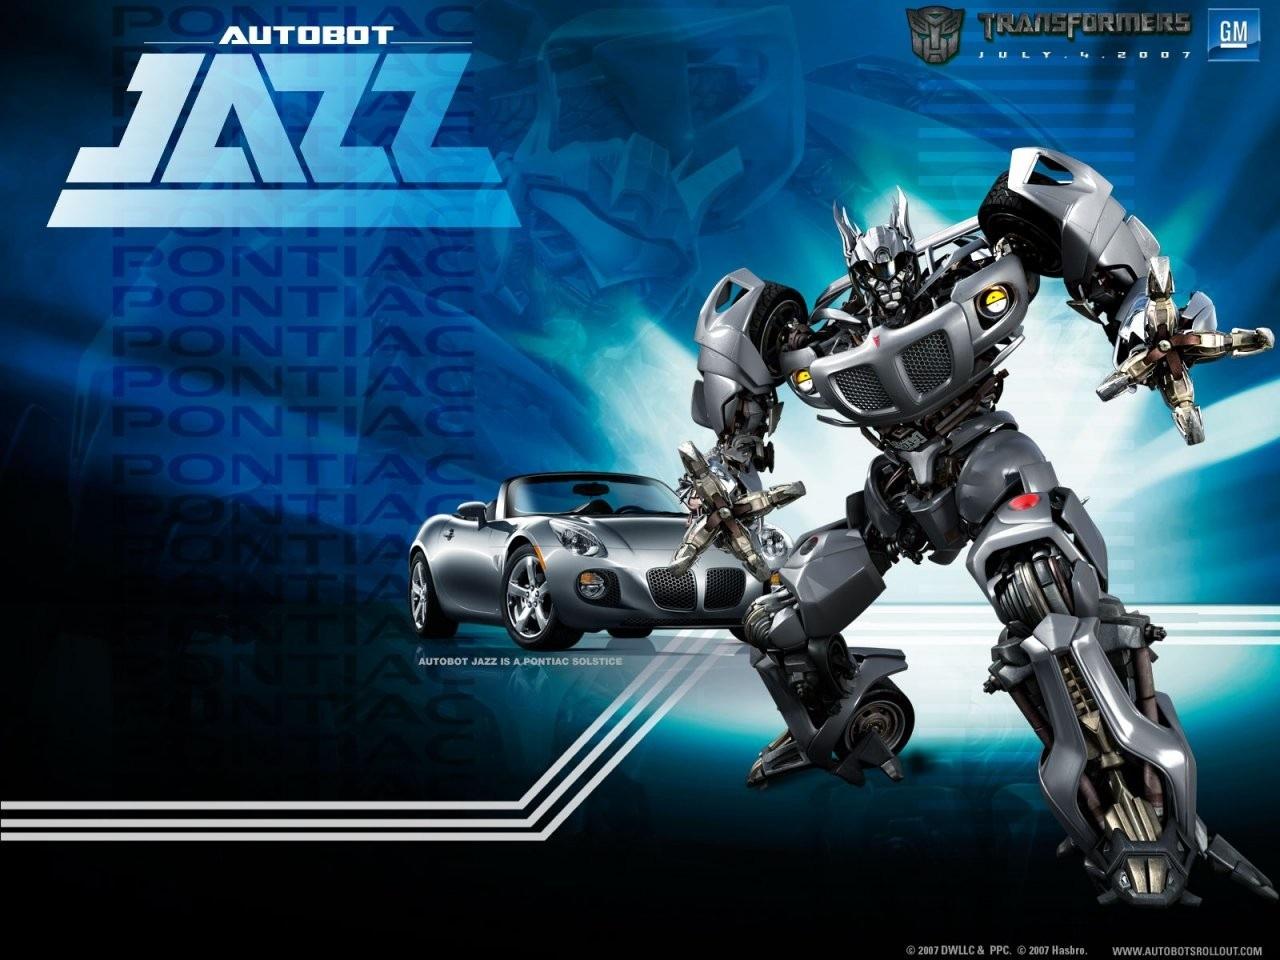 Wallpapers Film en serie Transformers 2